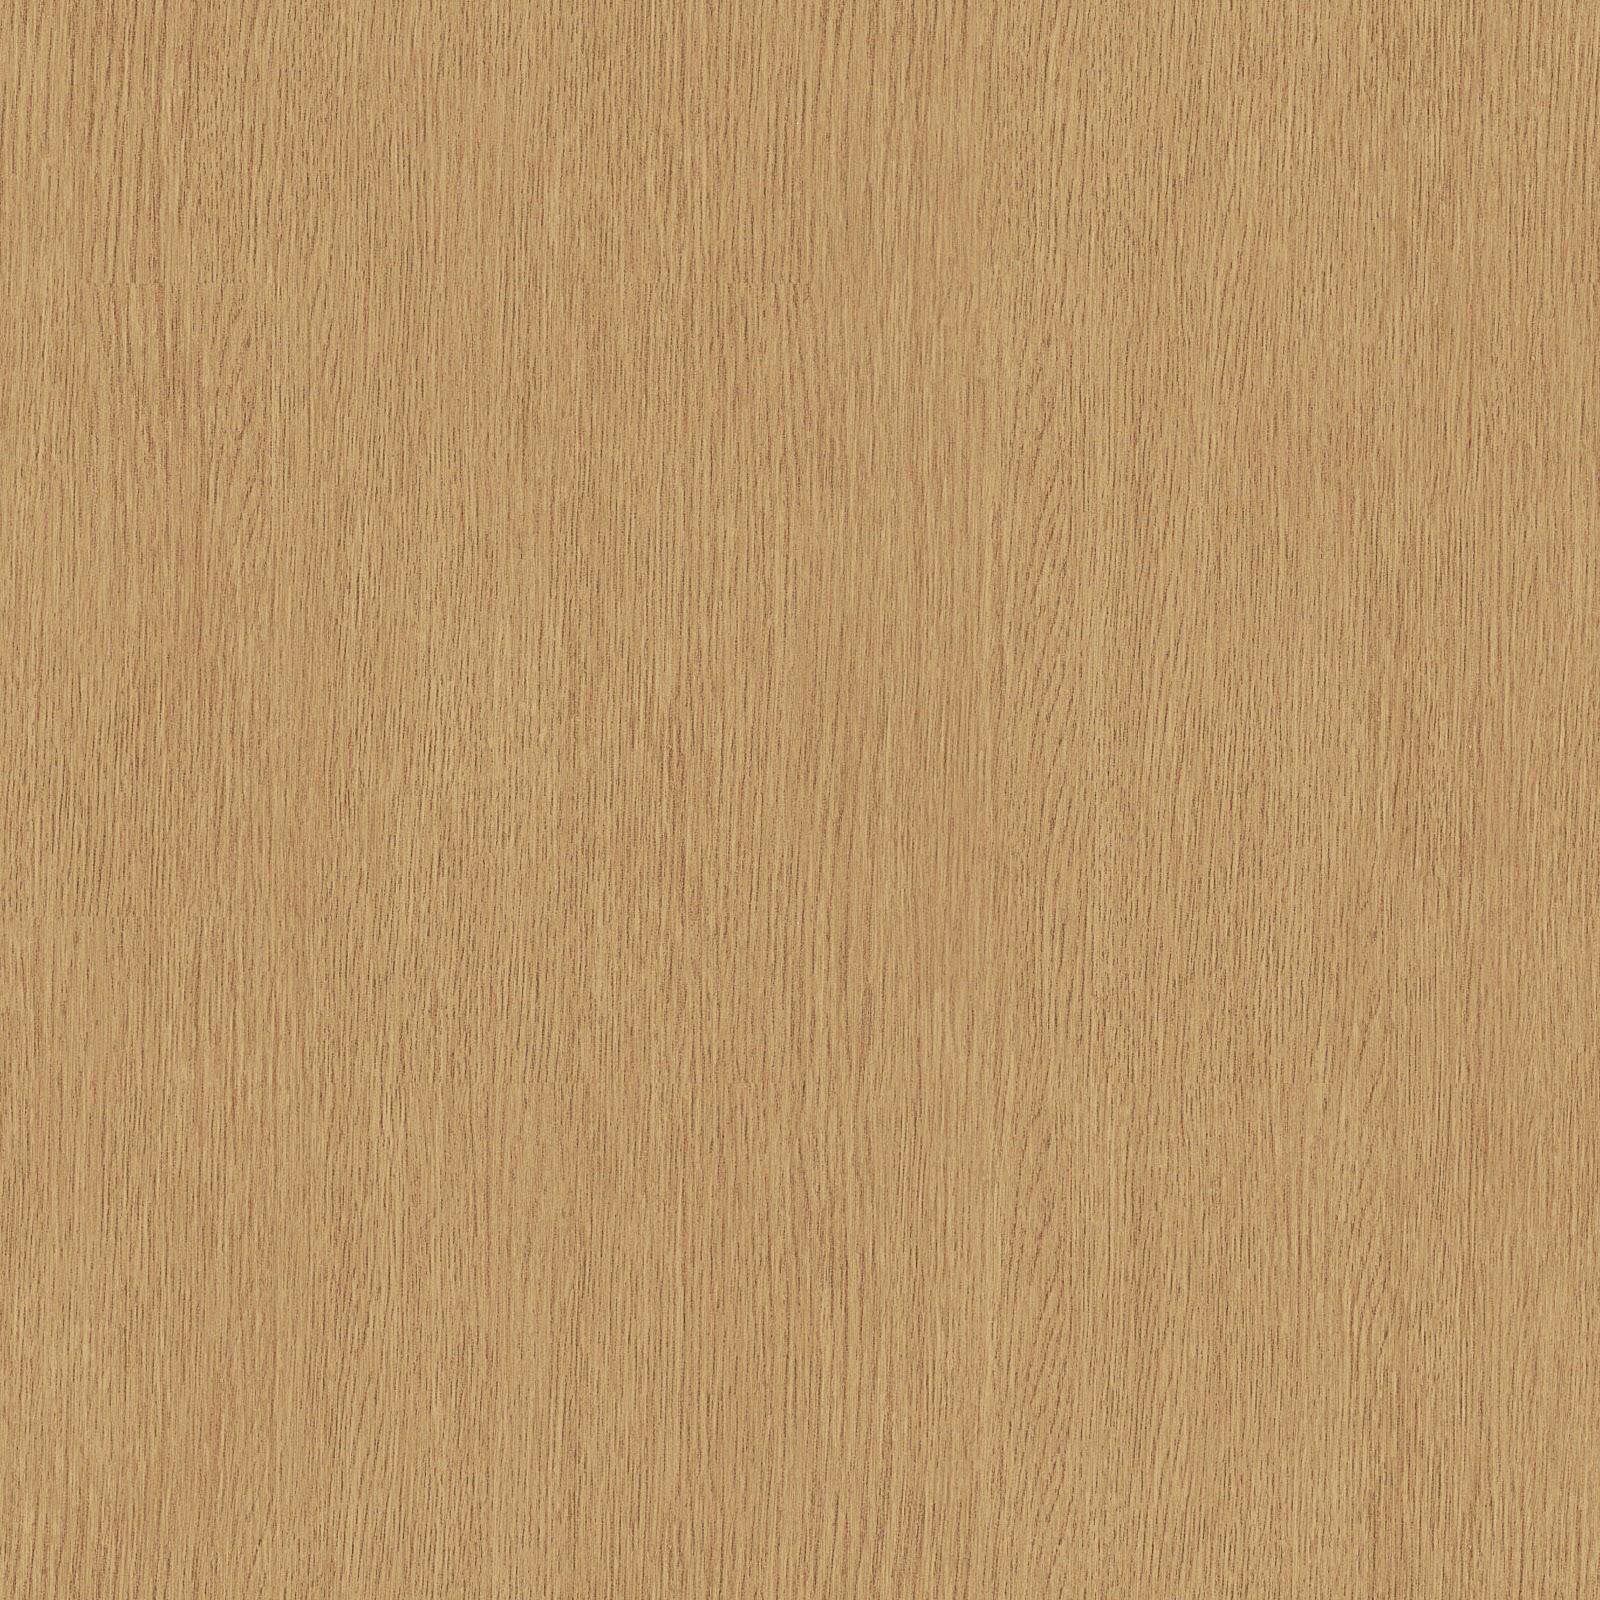 Seamless Glued Laminated Birch Wood Maps texturise 1600x1600